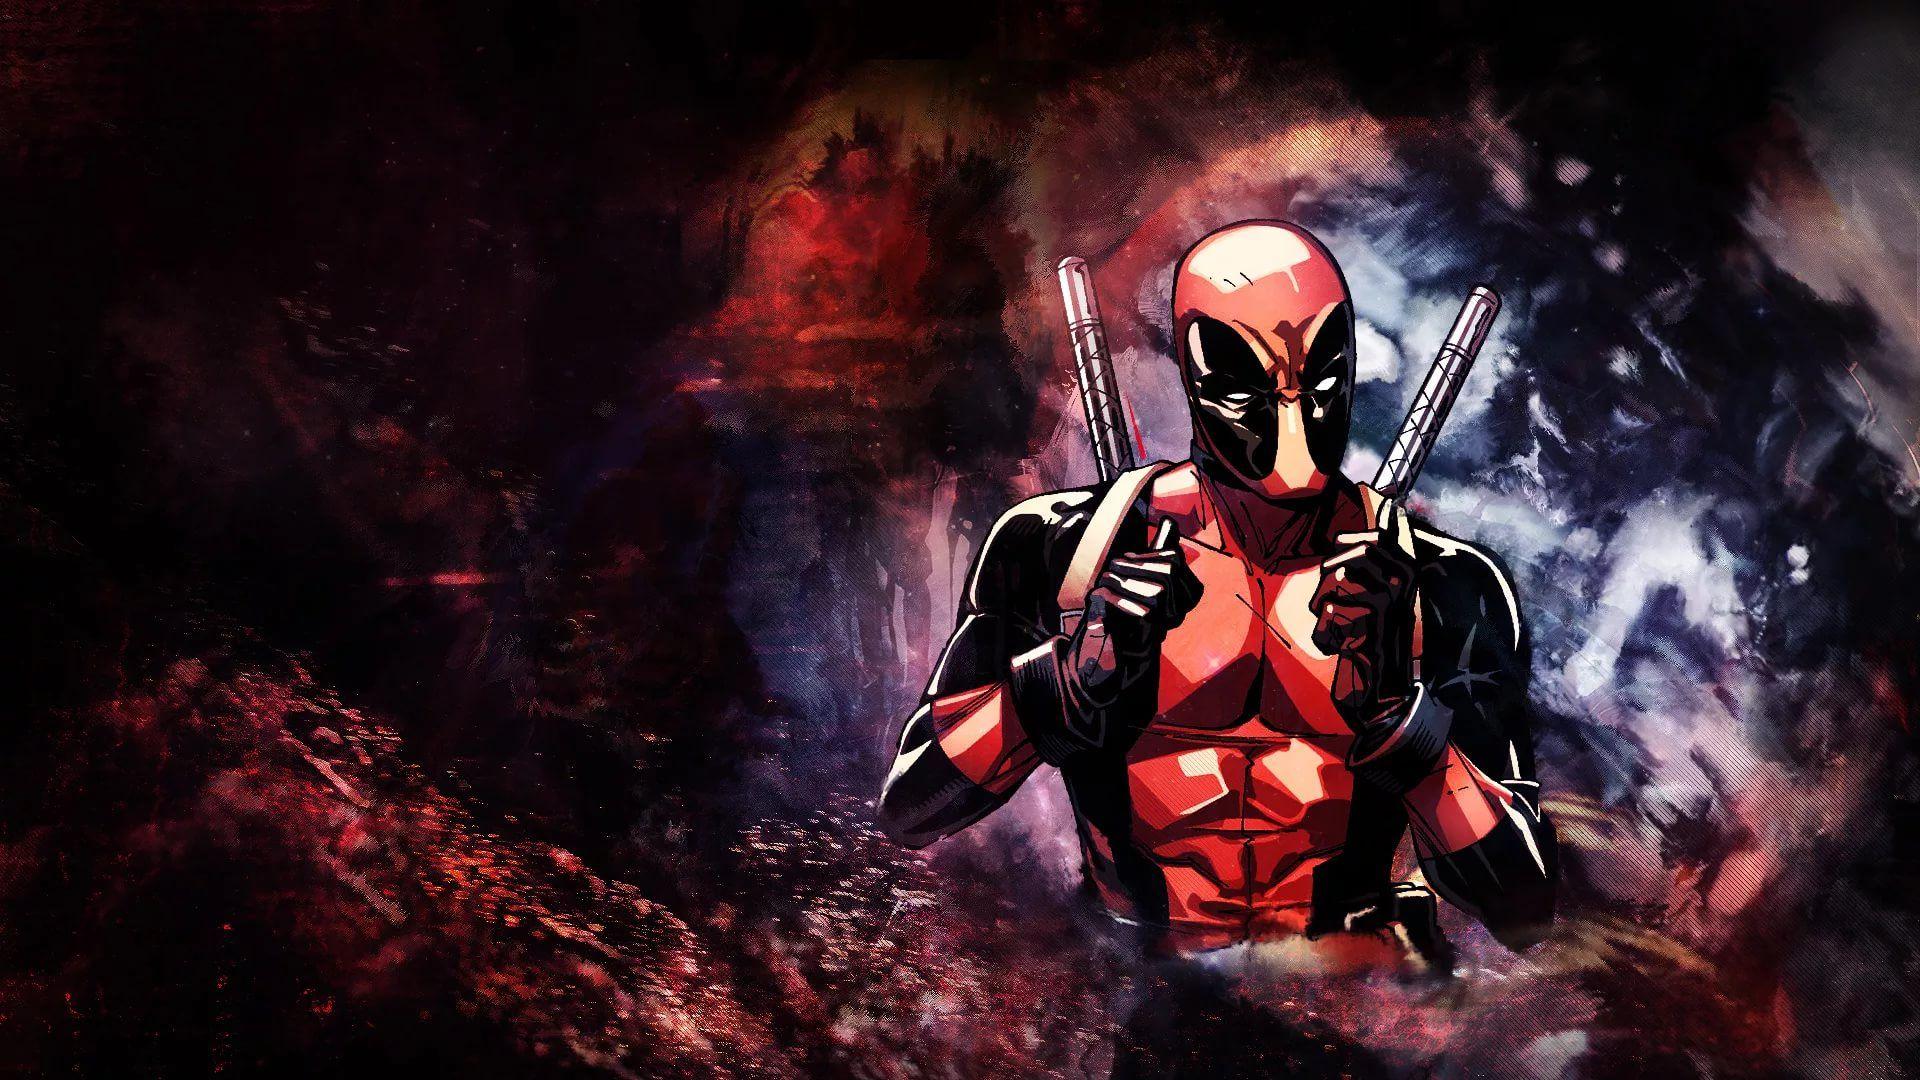 Cool Deadpool a wallpaper